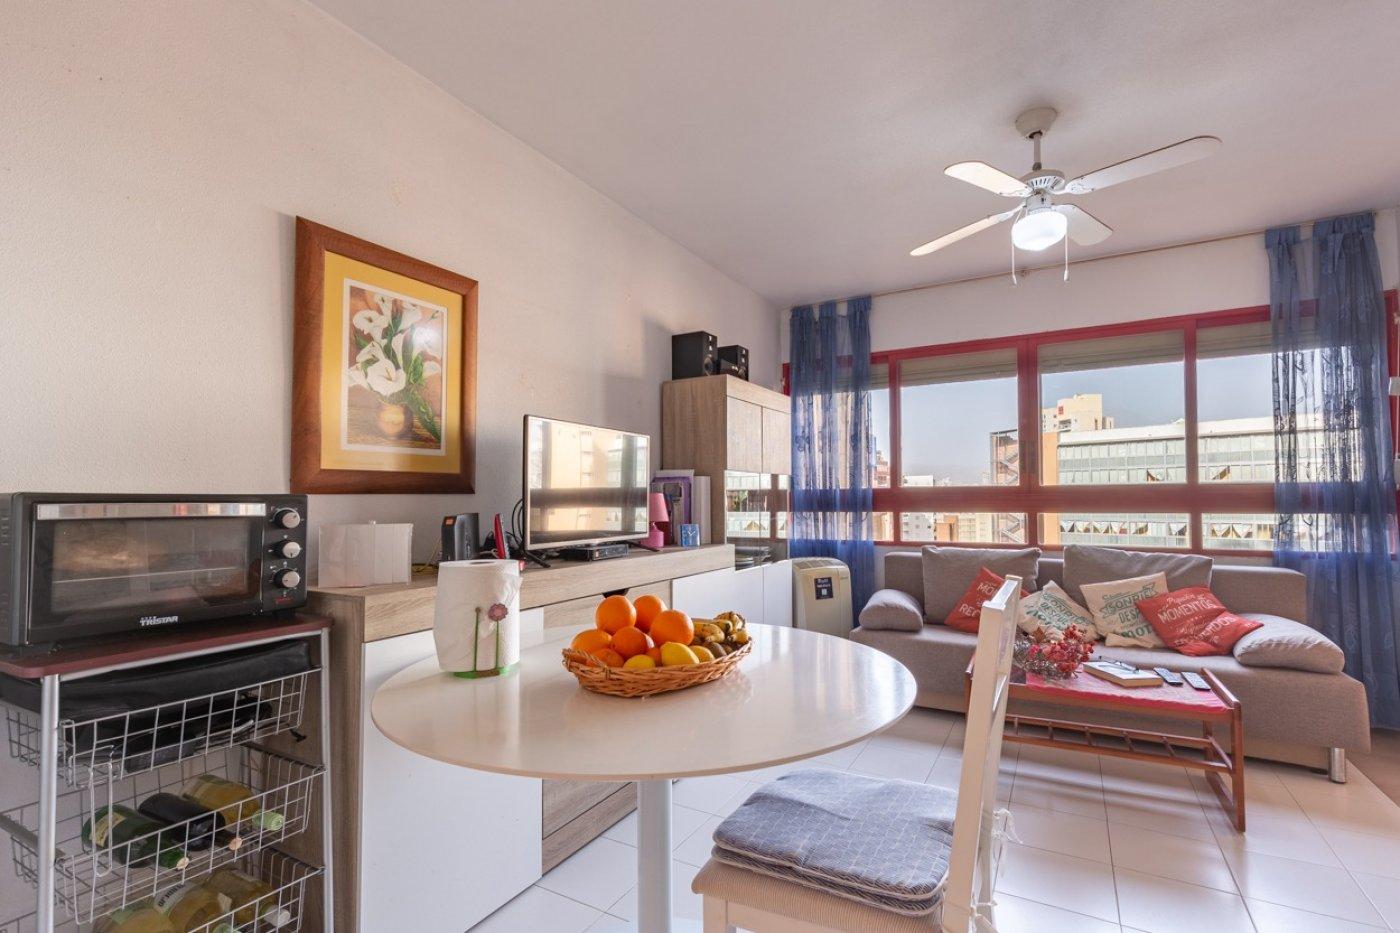 Apartamento en Benidorm zona Rincon de Loix de 86 m²